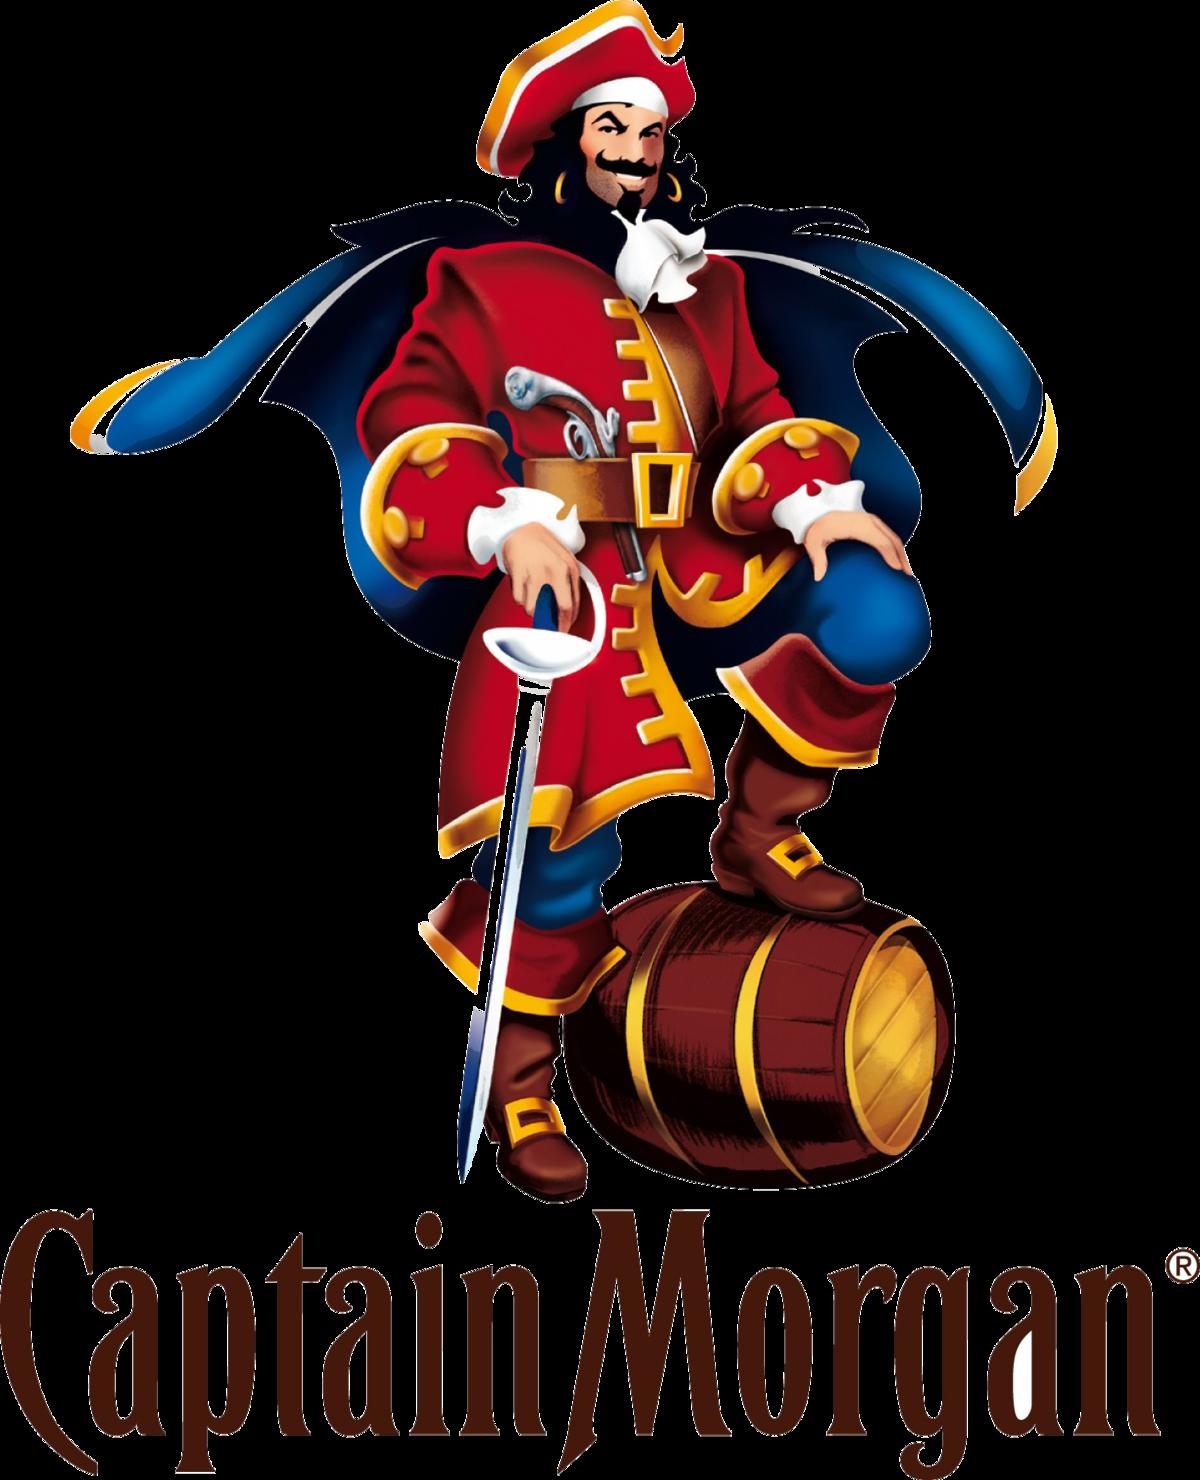 Captain Morgan Long Island Iced Tea Near Me